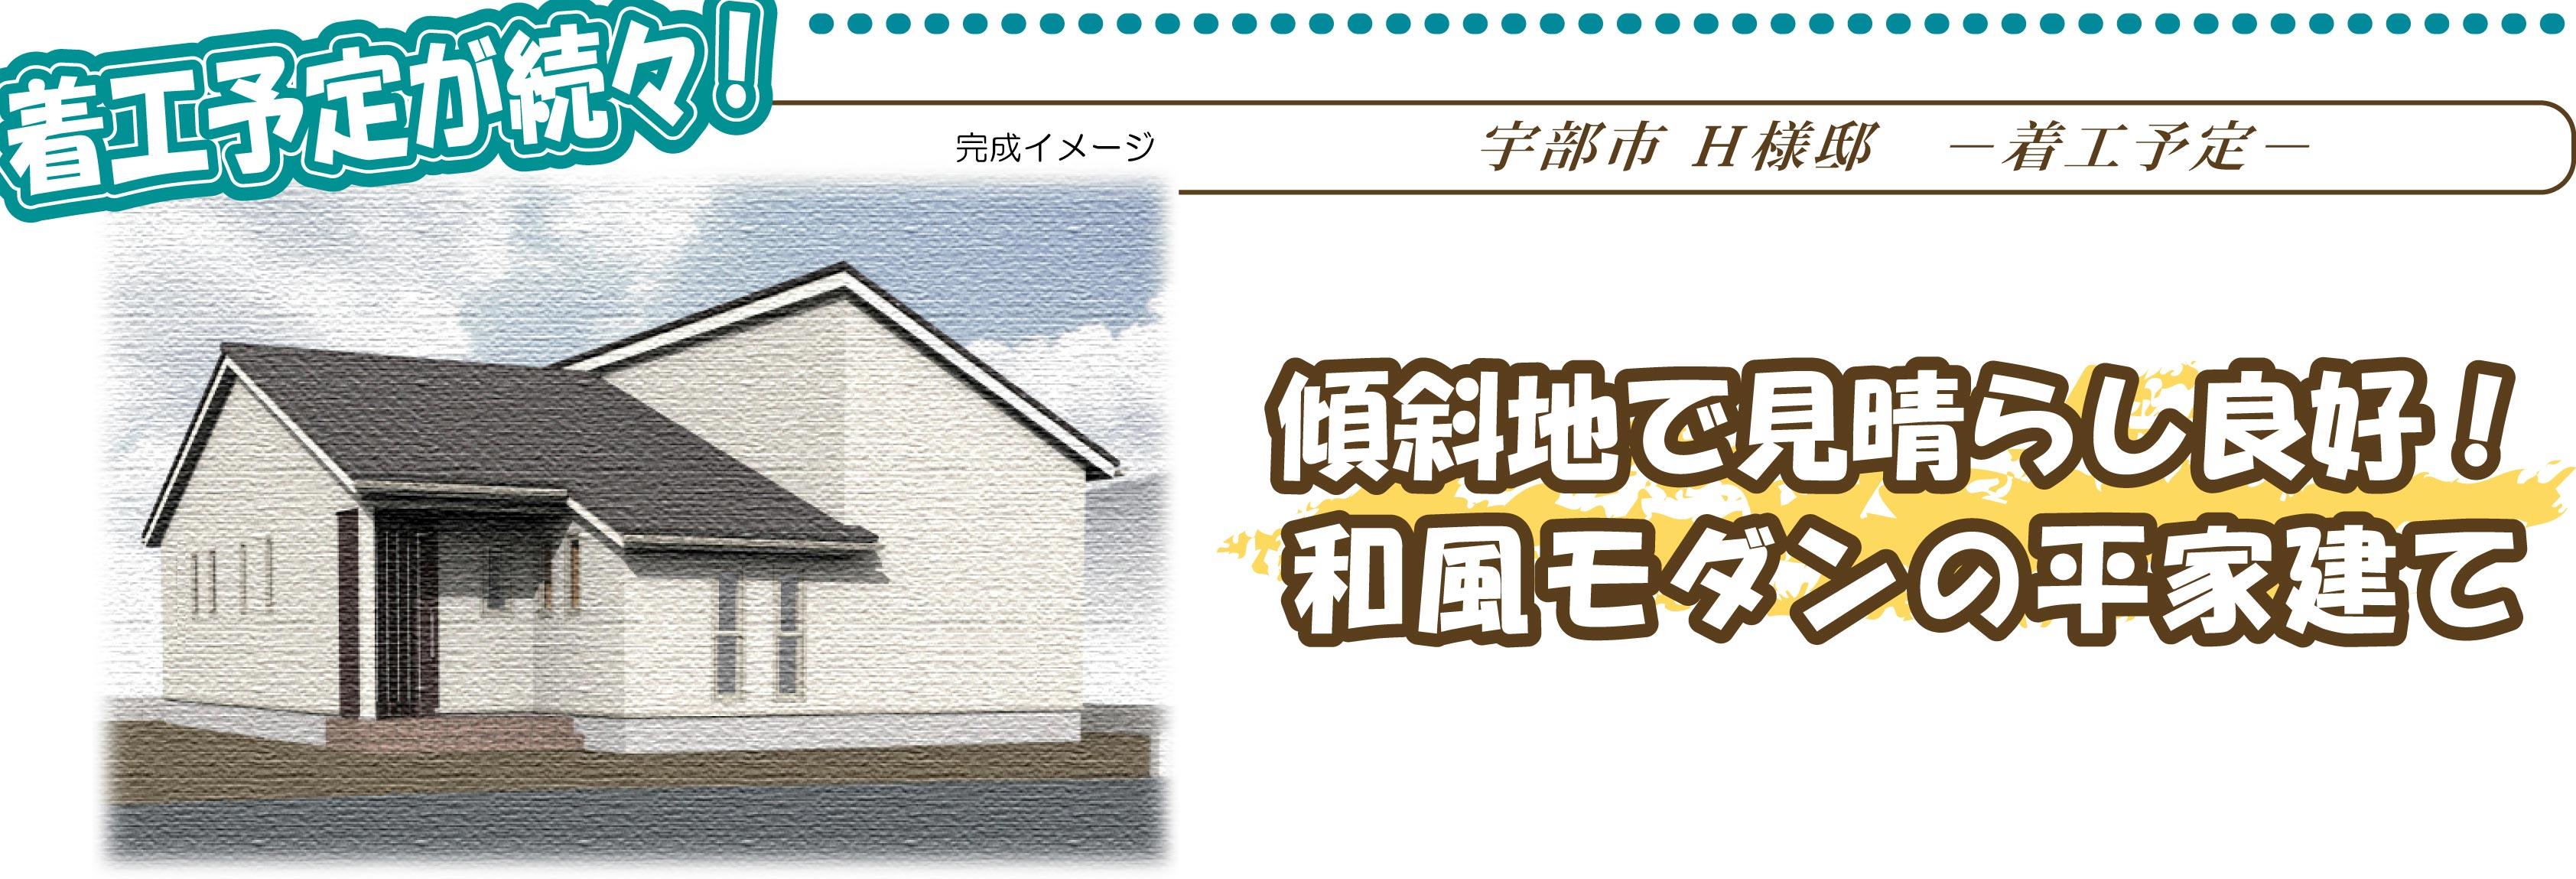 KuraSi-natu-sin77-03.jpg